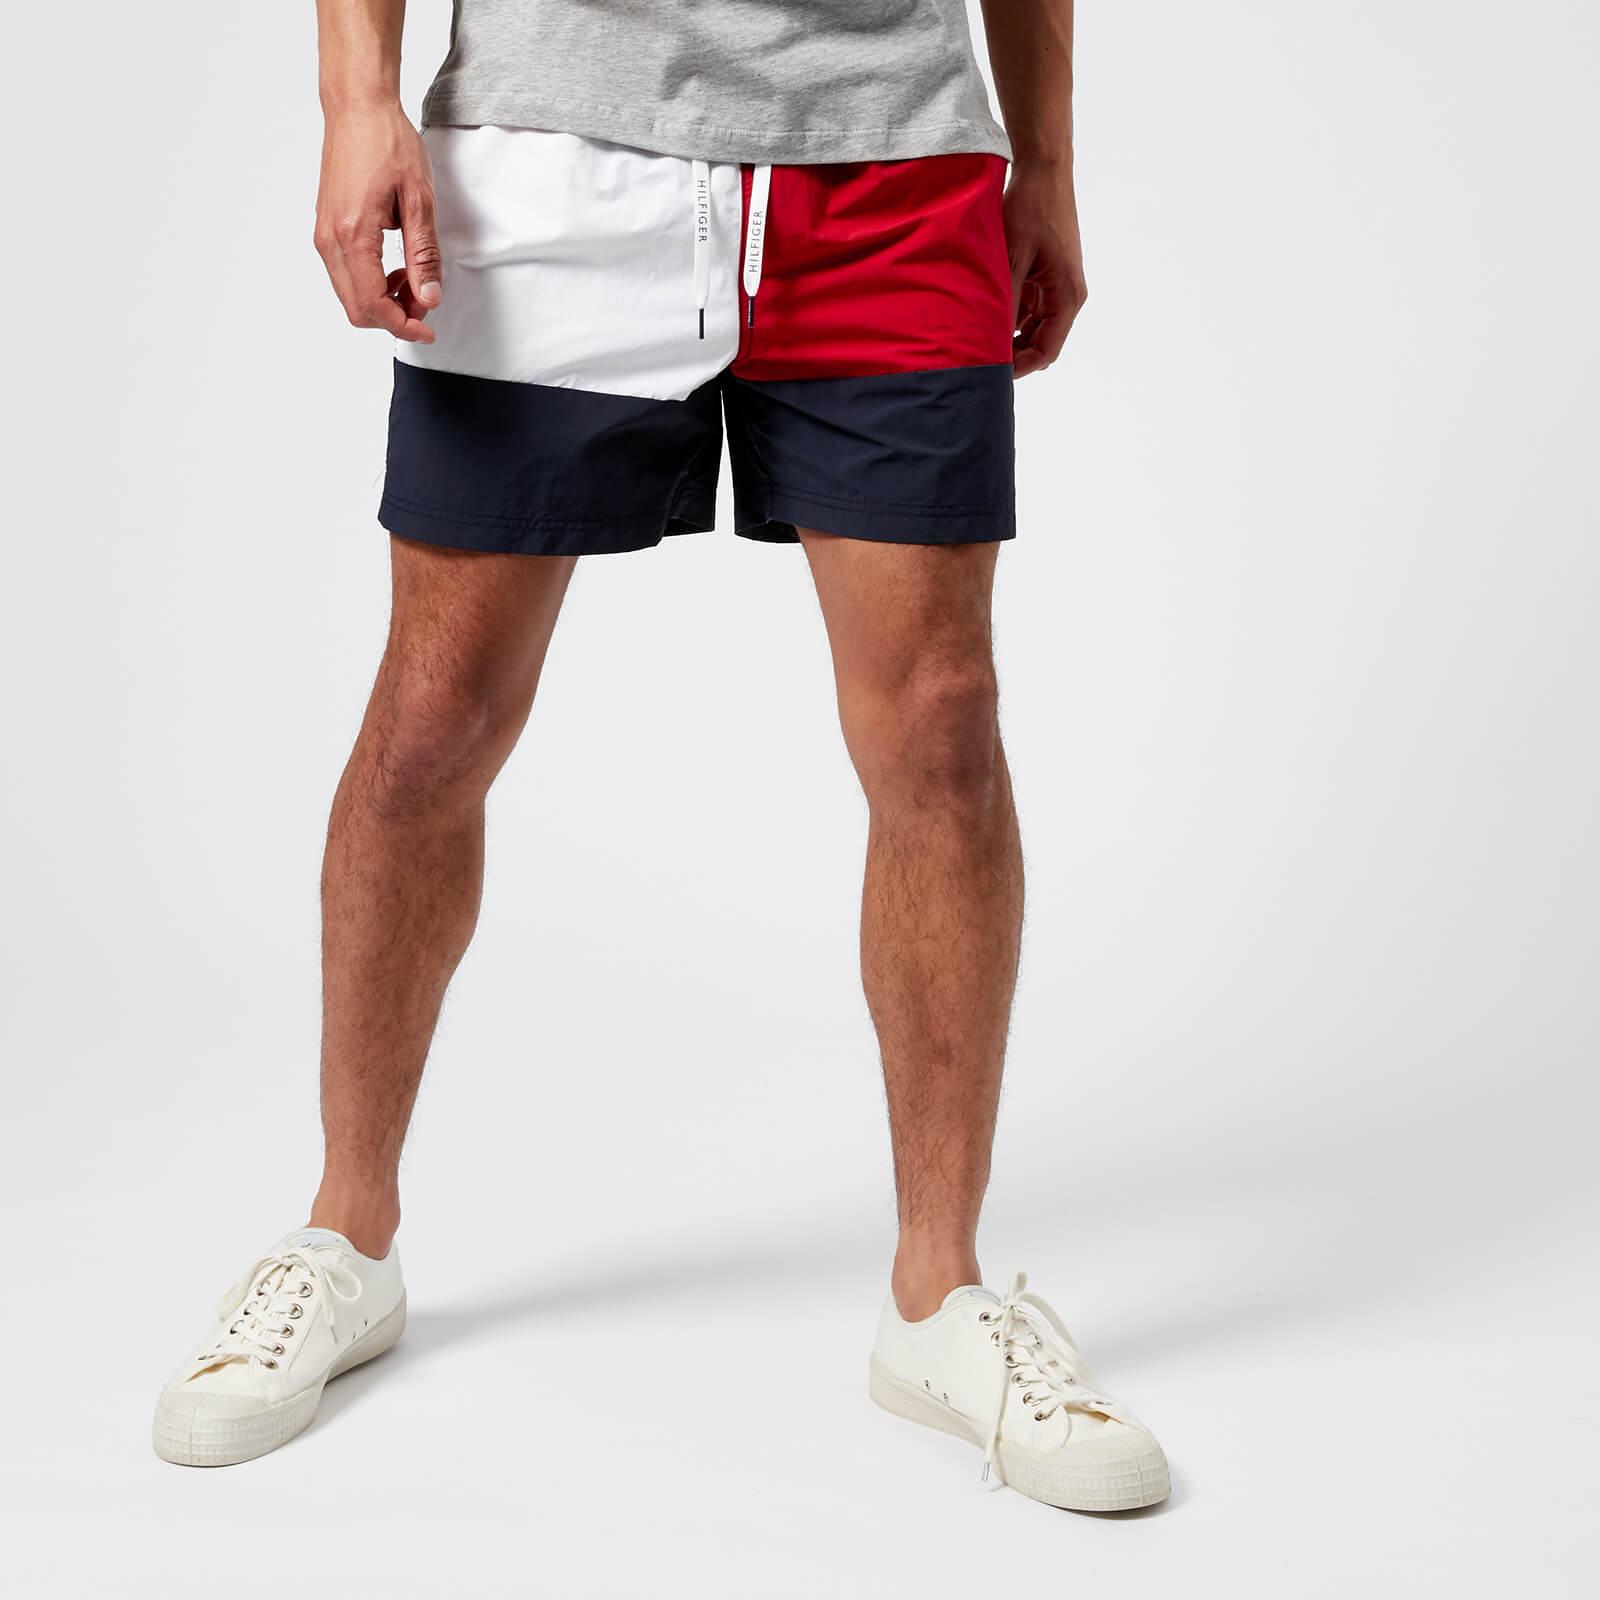 518cc0e1a Tommy Hilfiger Men's Medium Drawstring Flag Swim Shorts - Navy Blazer/Tango  Red